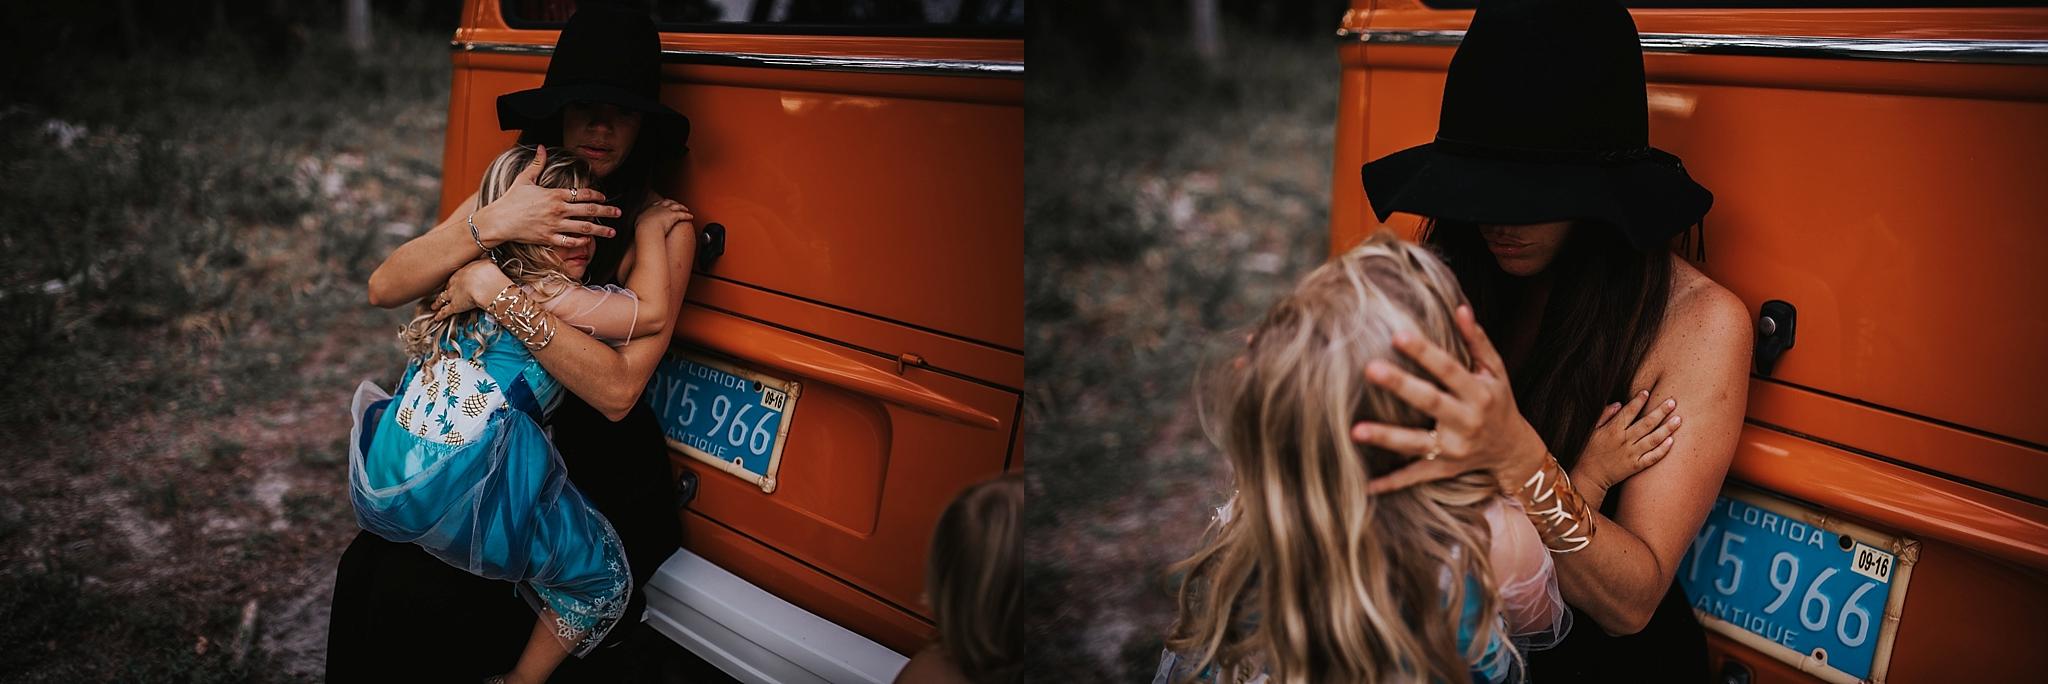 twyla jones photography - treasure coast - florida family photography riverbend park jupiter florida-6313.jpg